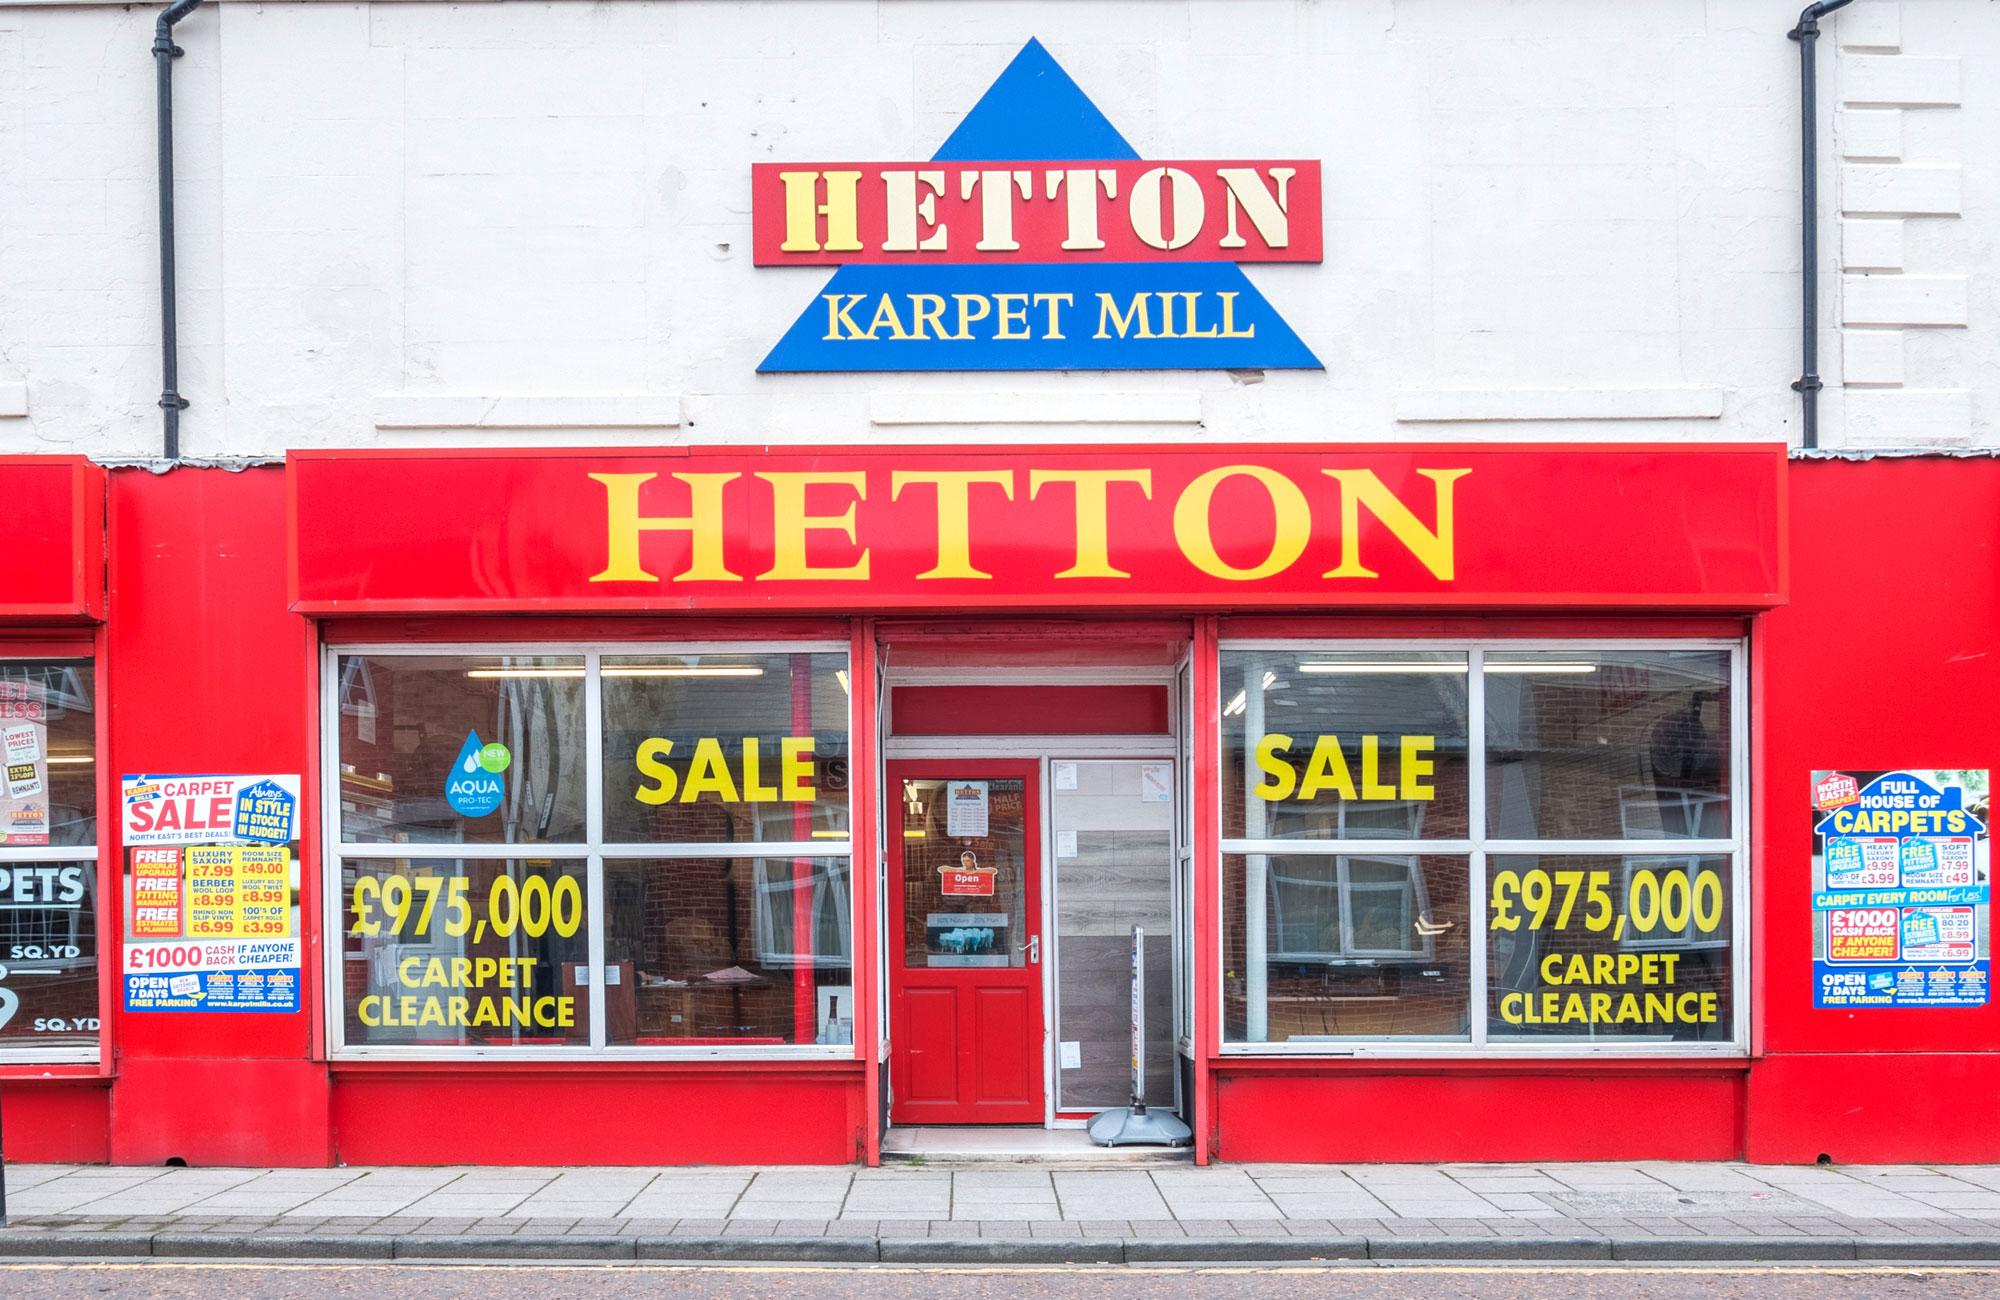 Hetton Karpet Mills